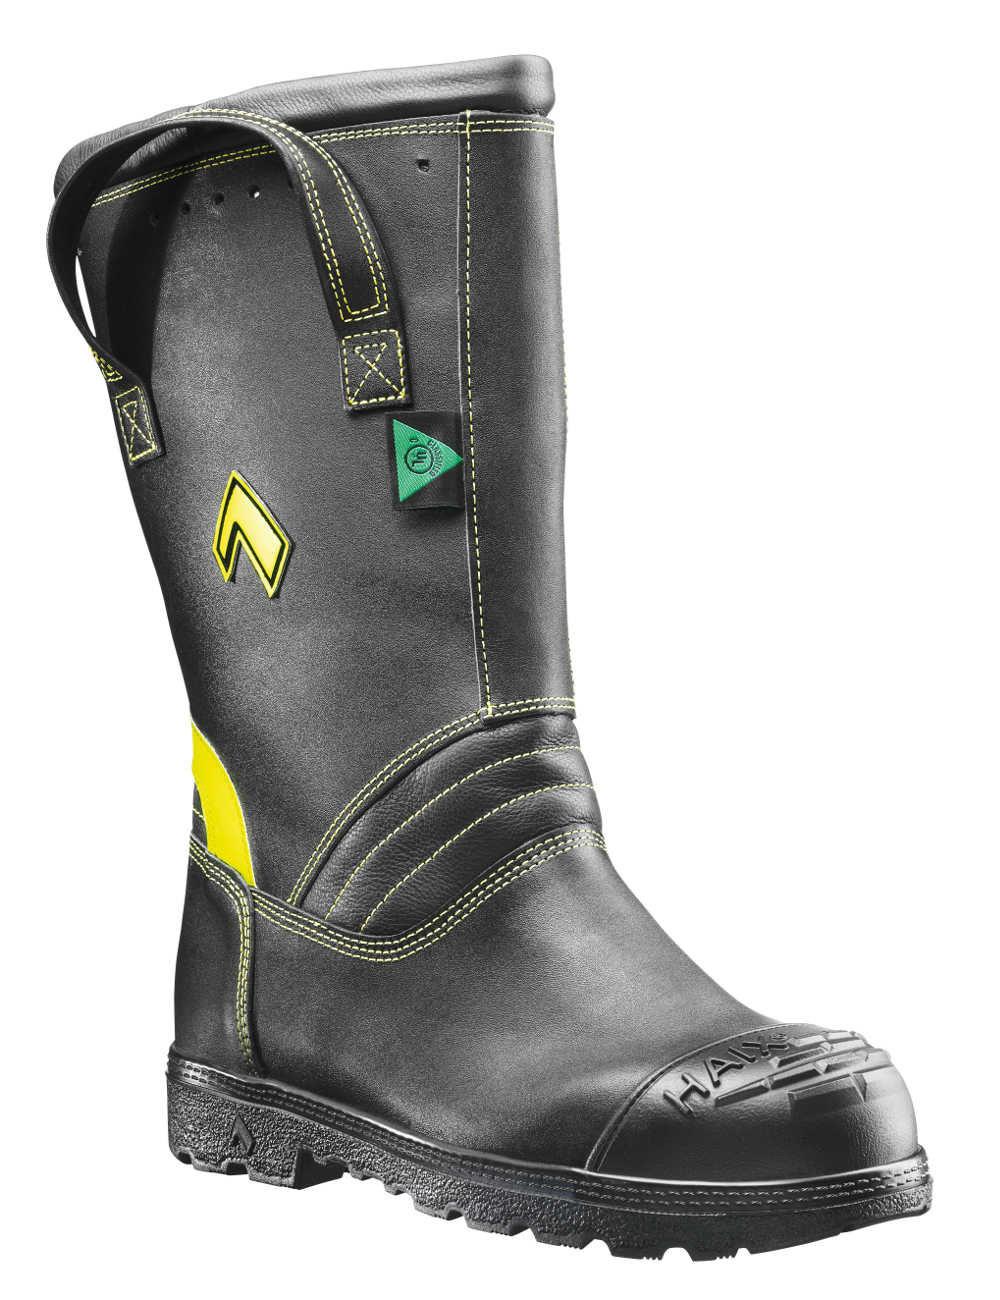 HAIX HAIX Men's Fire Hunter Xtreme Boot